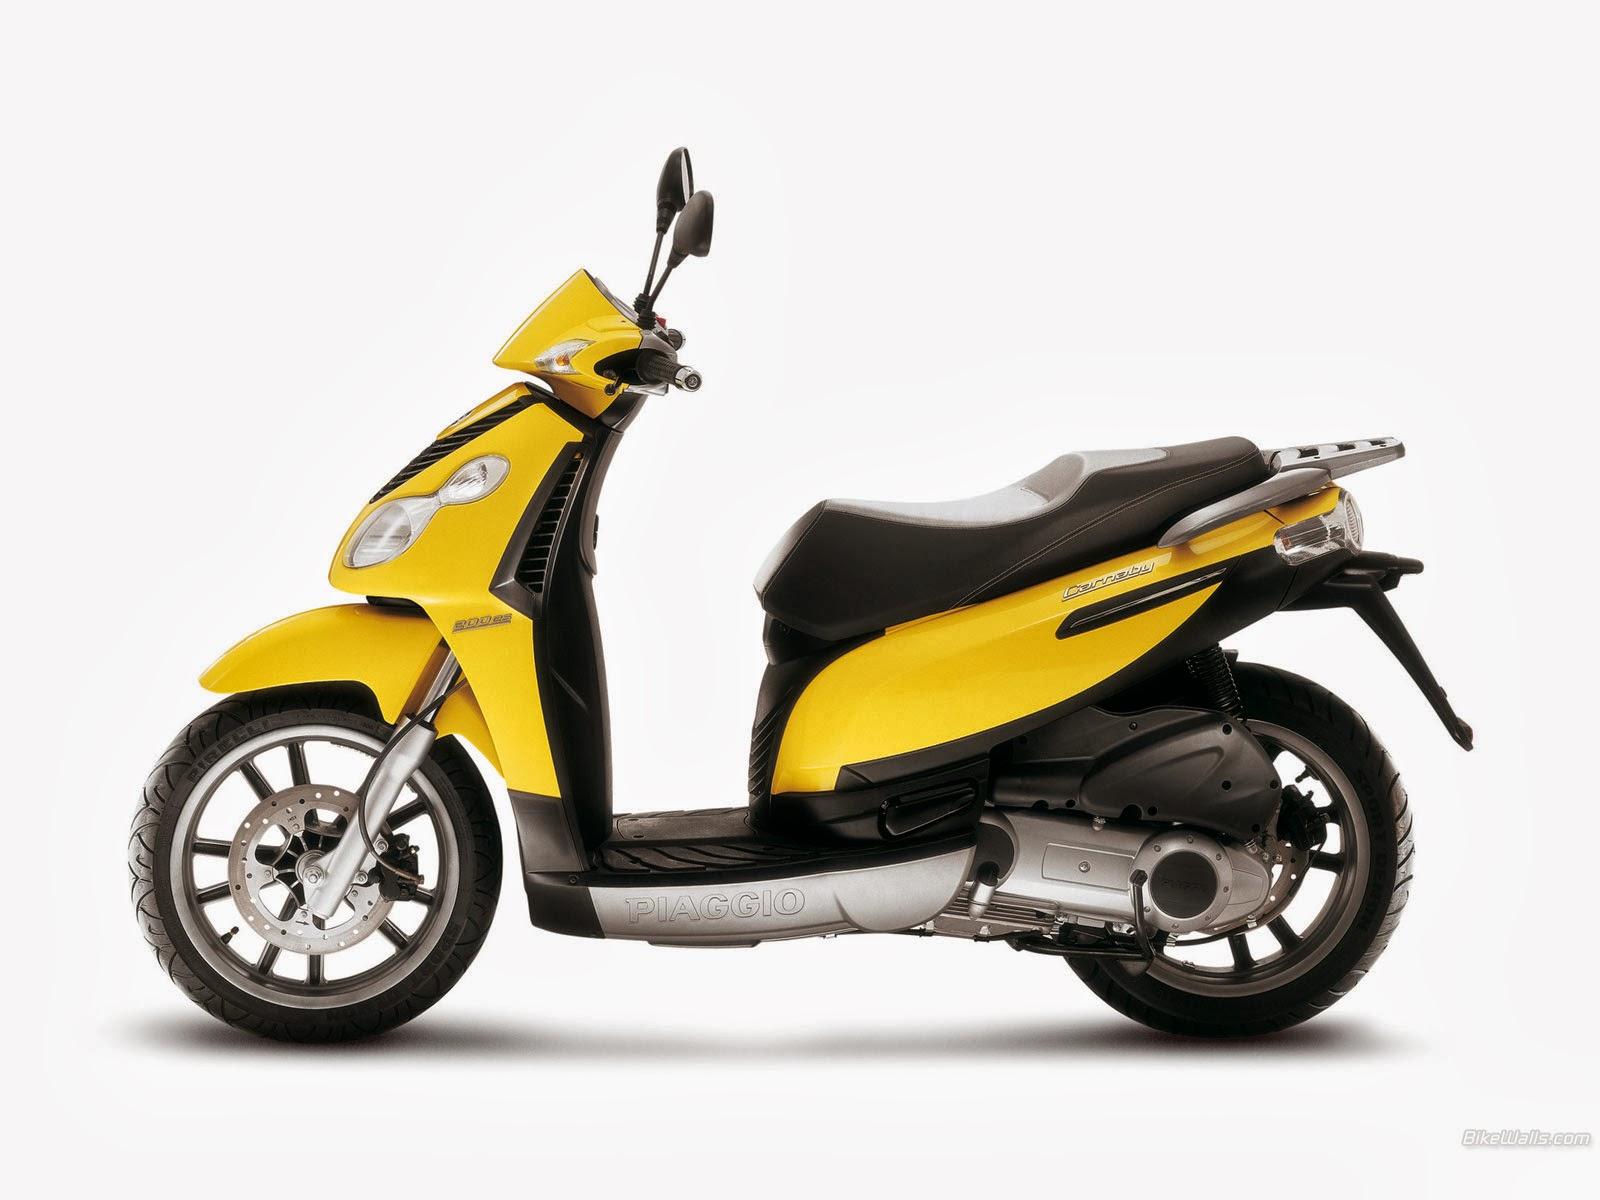 Piaggio Carnaby-1 - Piaggio Motor